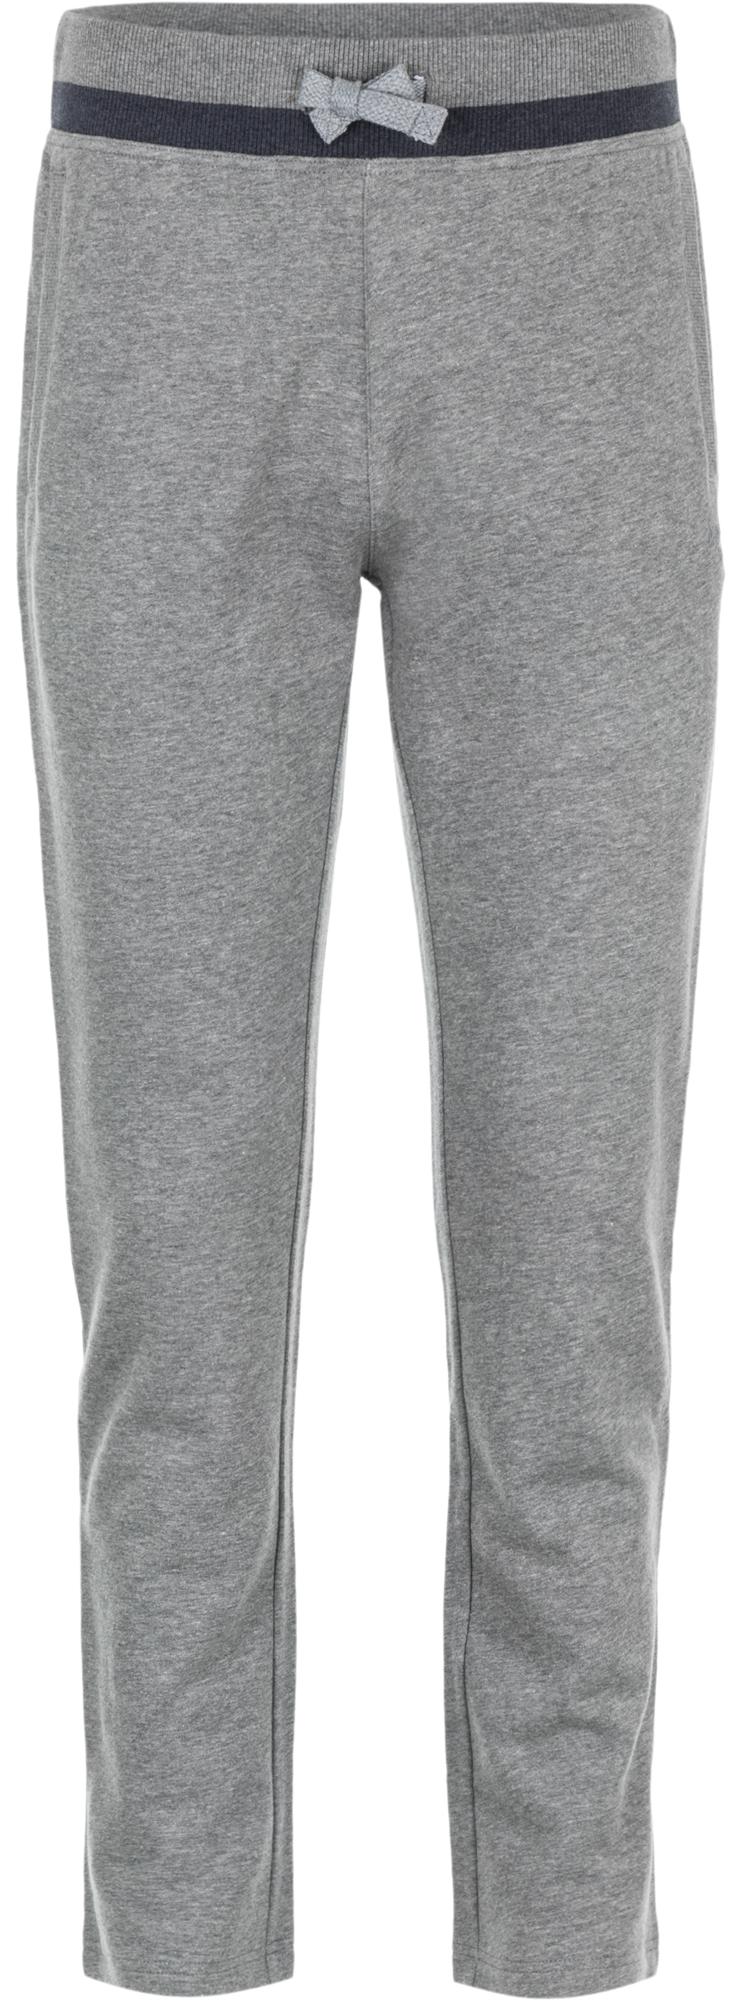 Demix Брюки мужские Demix брюки спортивного стиля мужские